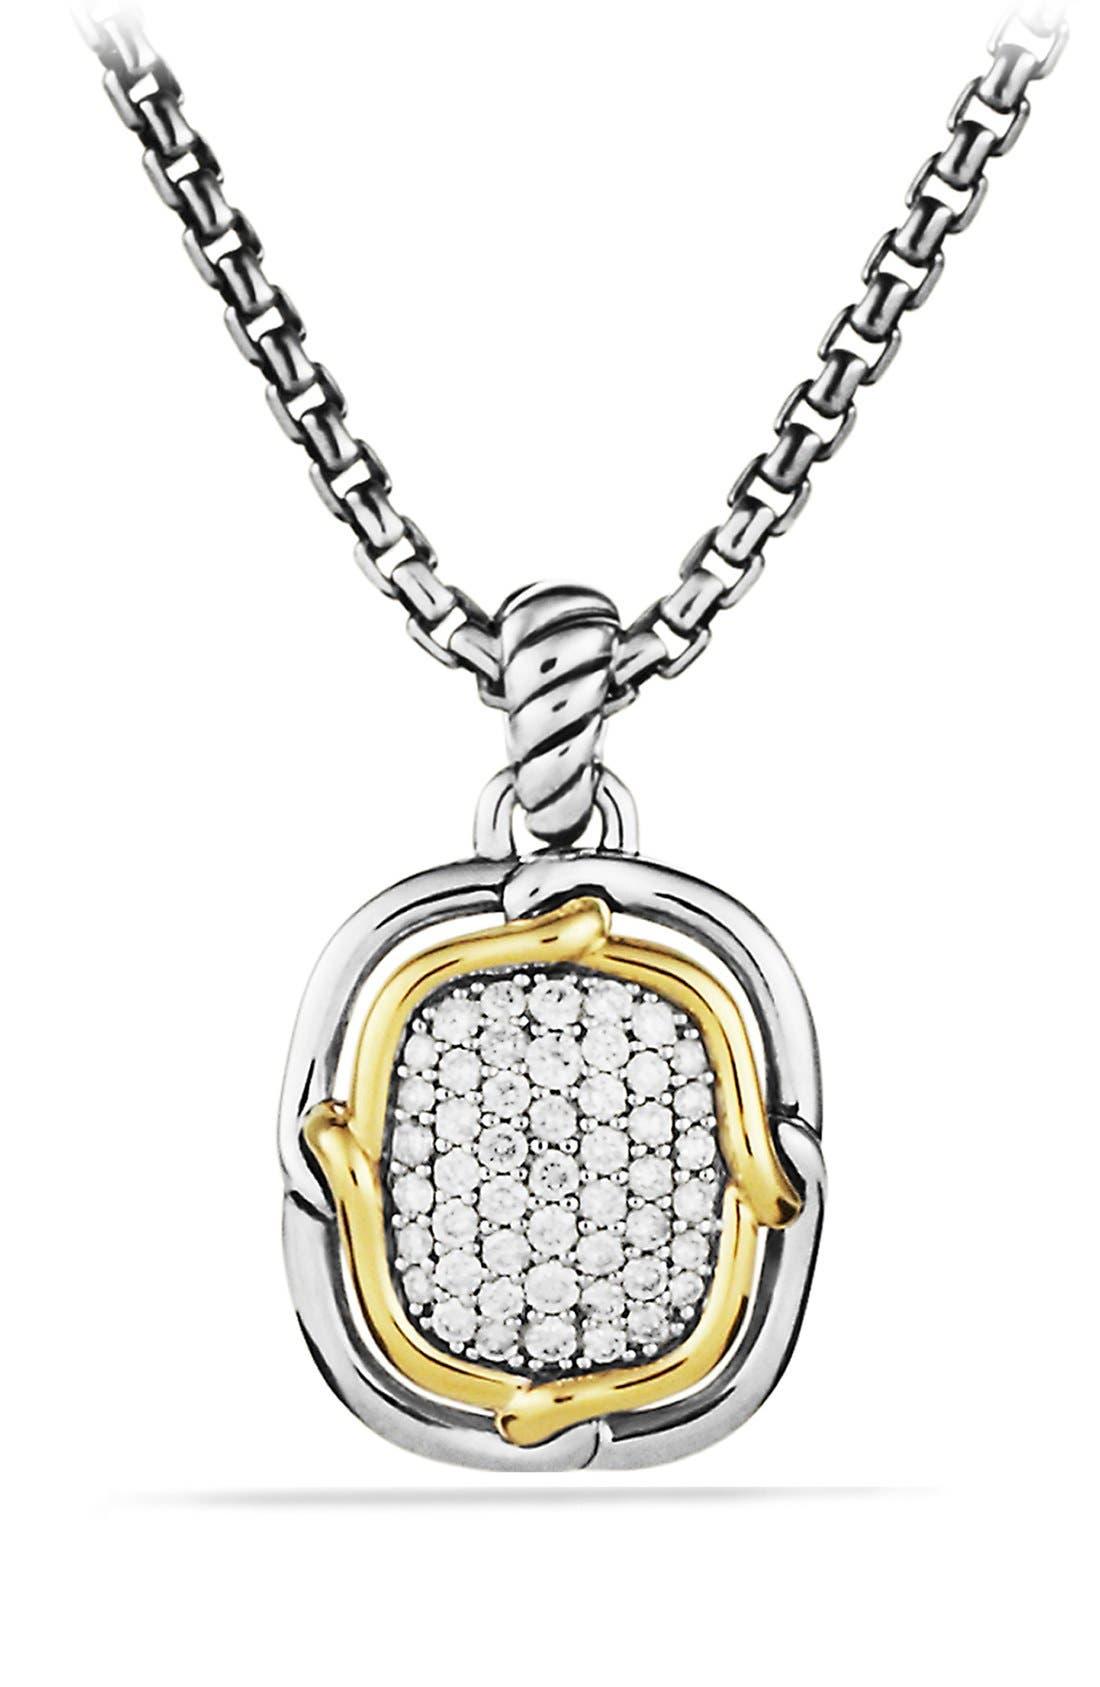 Main Image - David Yurman 'Labyrinth' Pendant with Diamonds and Gold